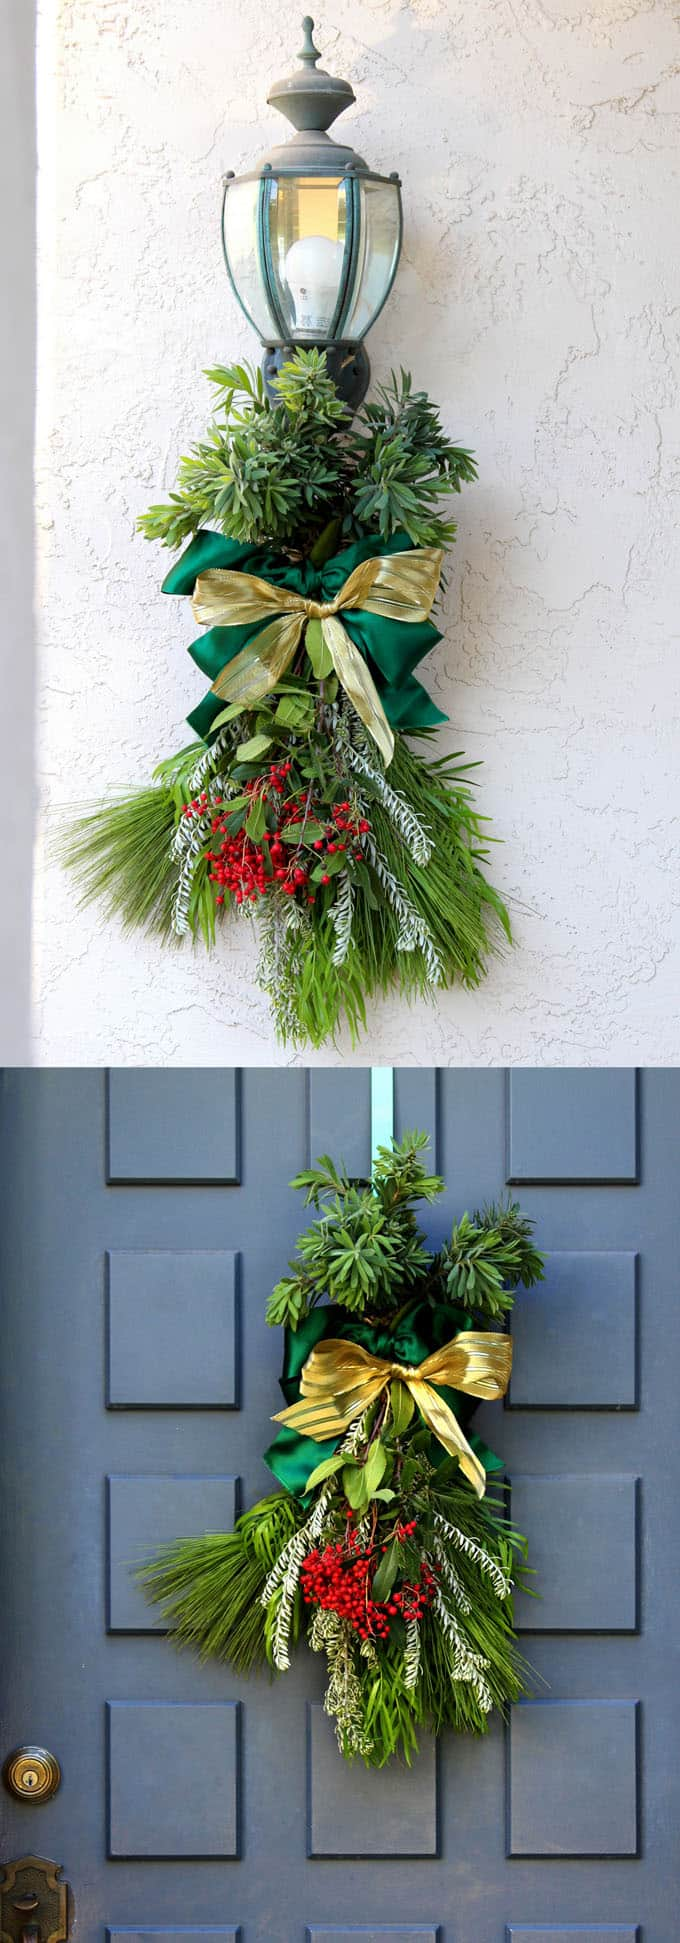 easy DIY Christmas swag apieceofrainbowblog 1 - The Easiest DIY Christmas Swag Ever